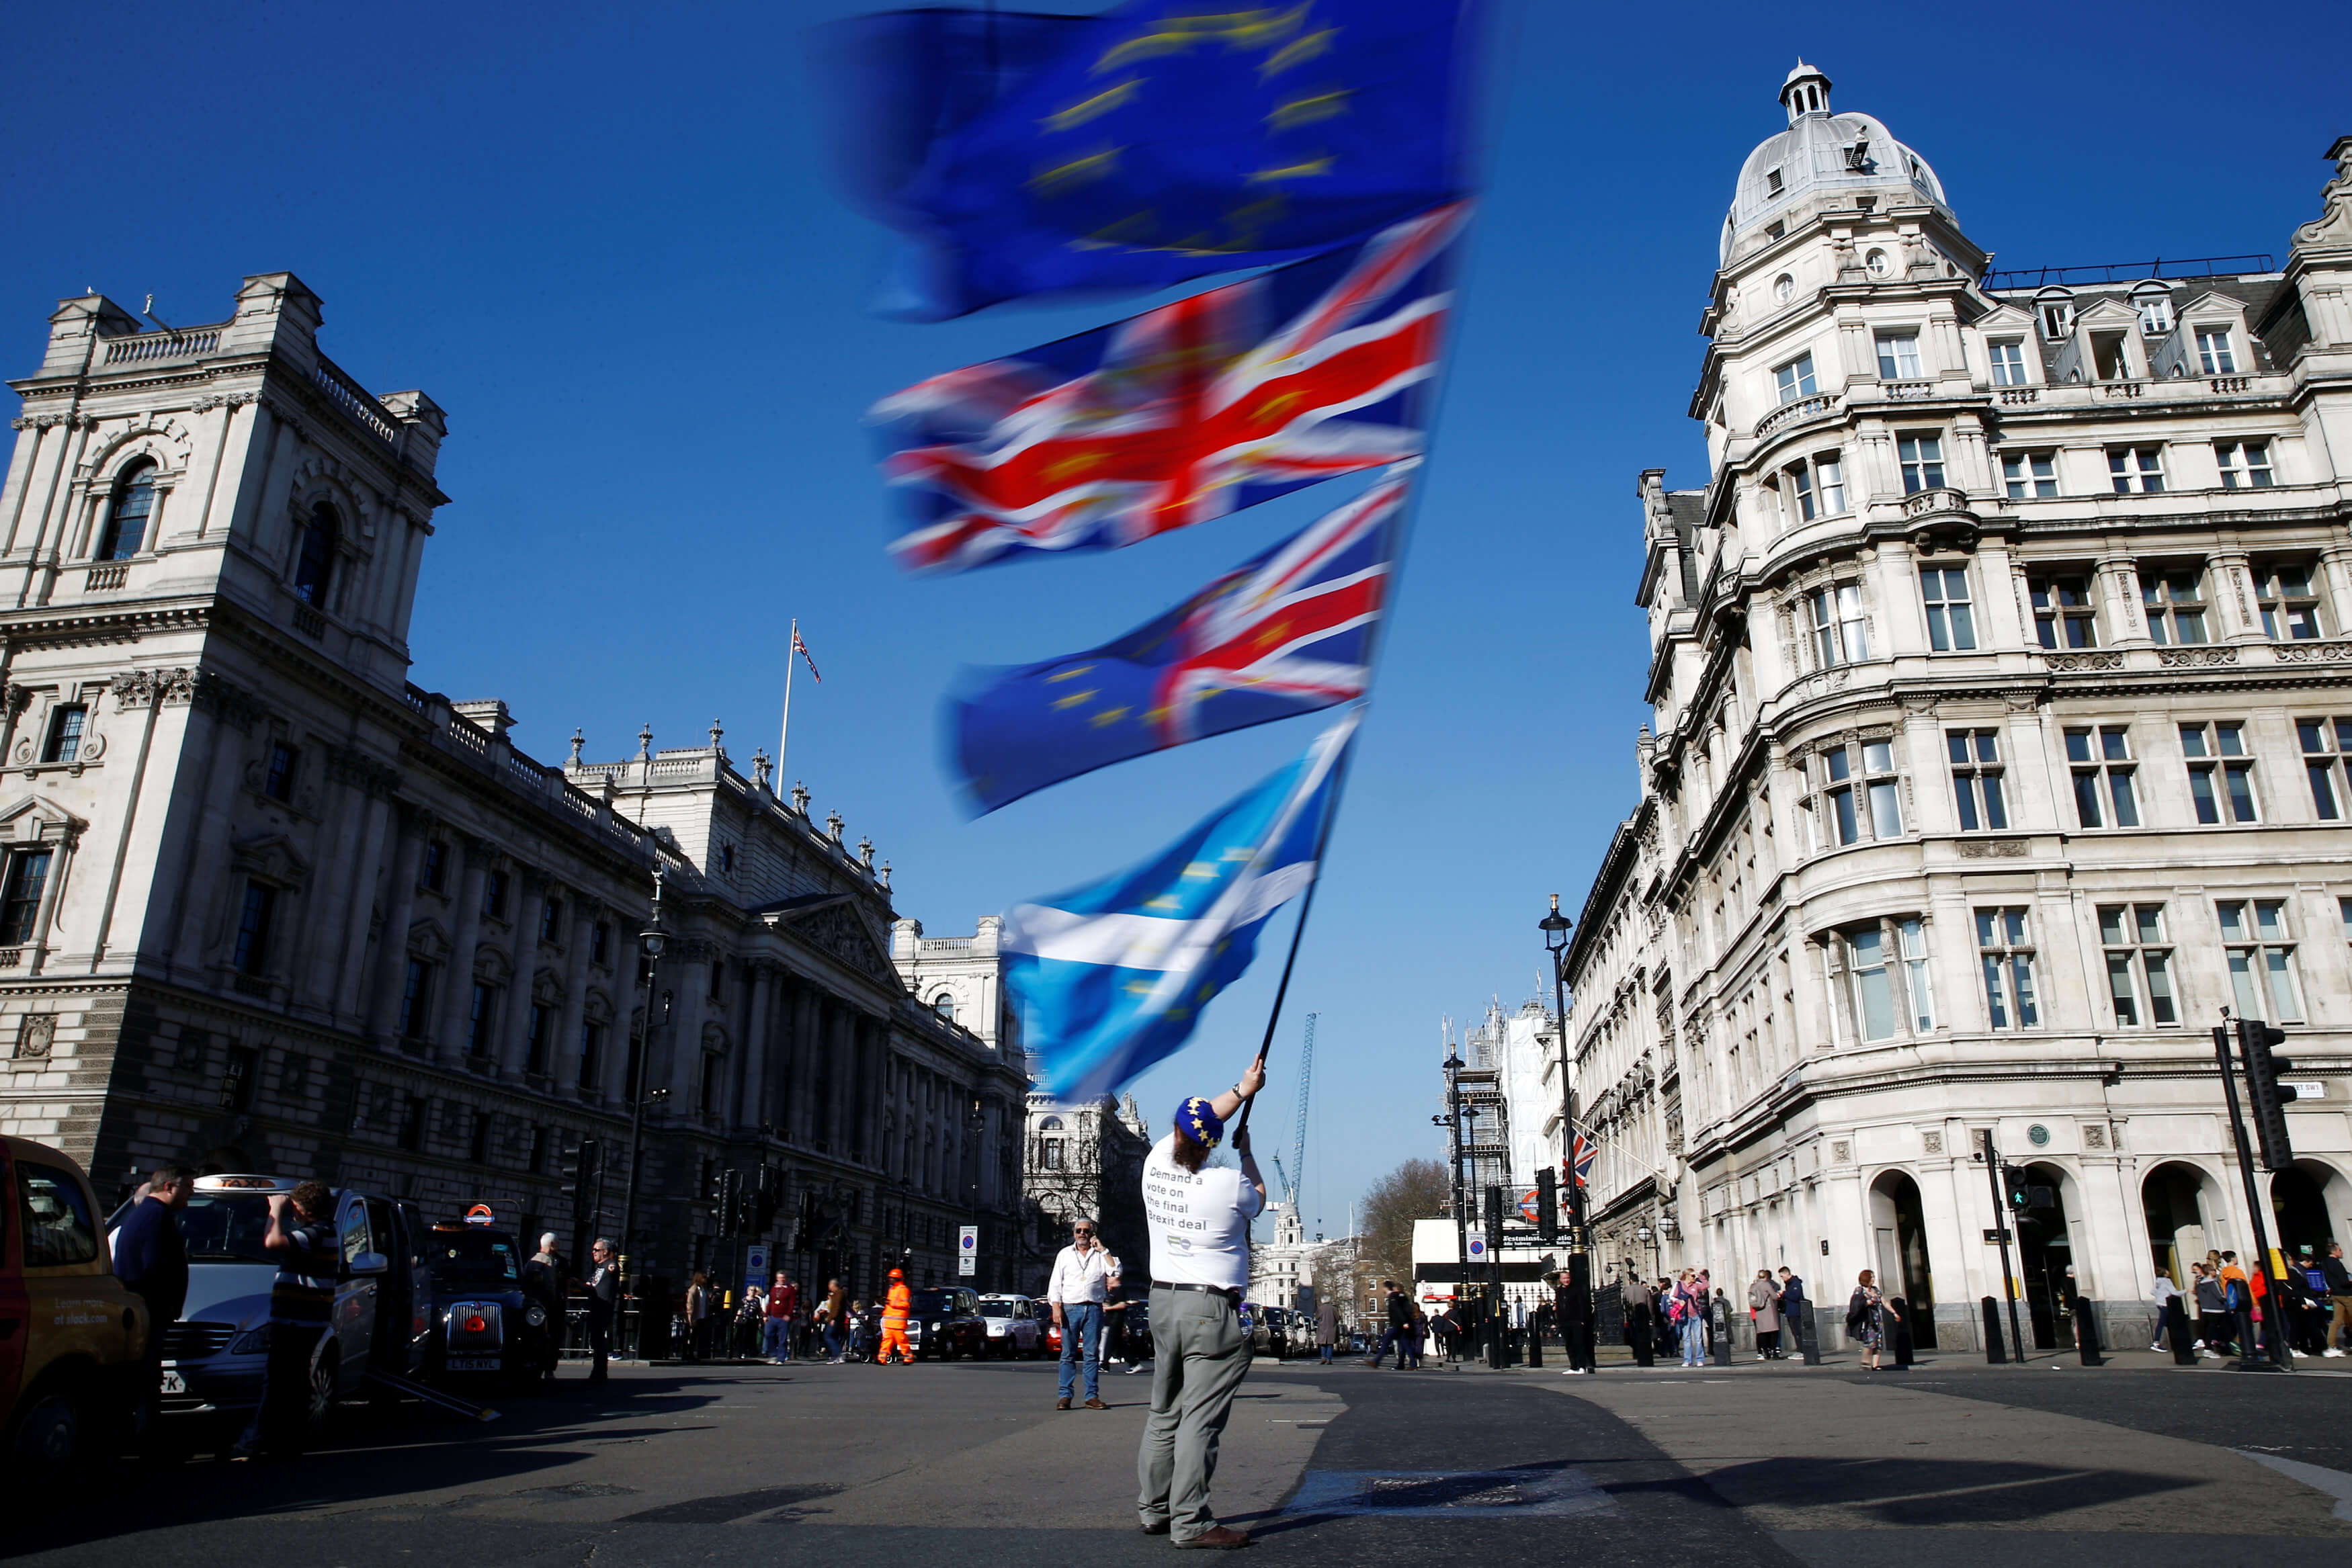 Brexit: Σκληρή δοκιμασία για το ευρωπαϊκό χρηματοπιστωτικό σύστημα μια άτακτη αποχώρηση